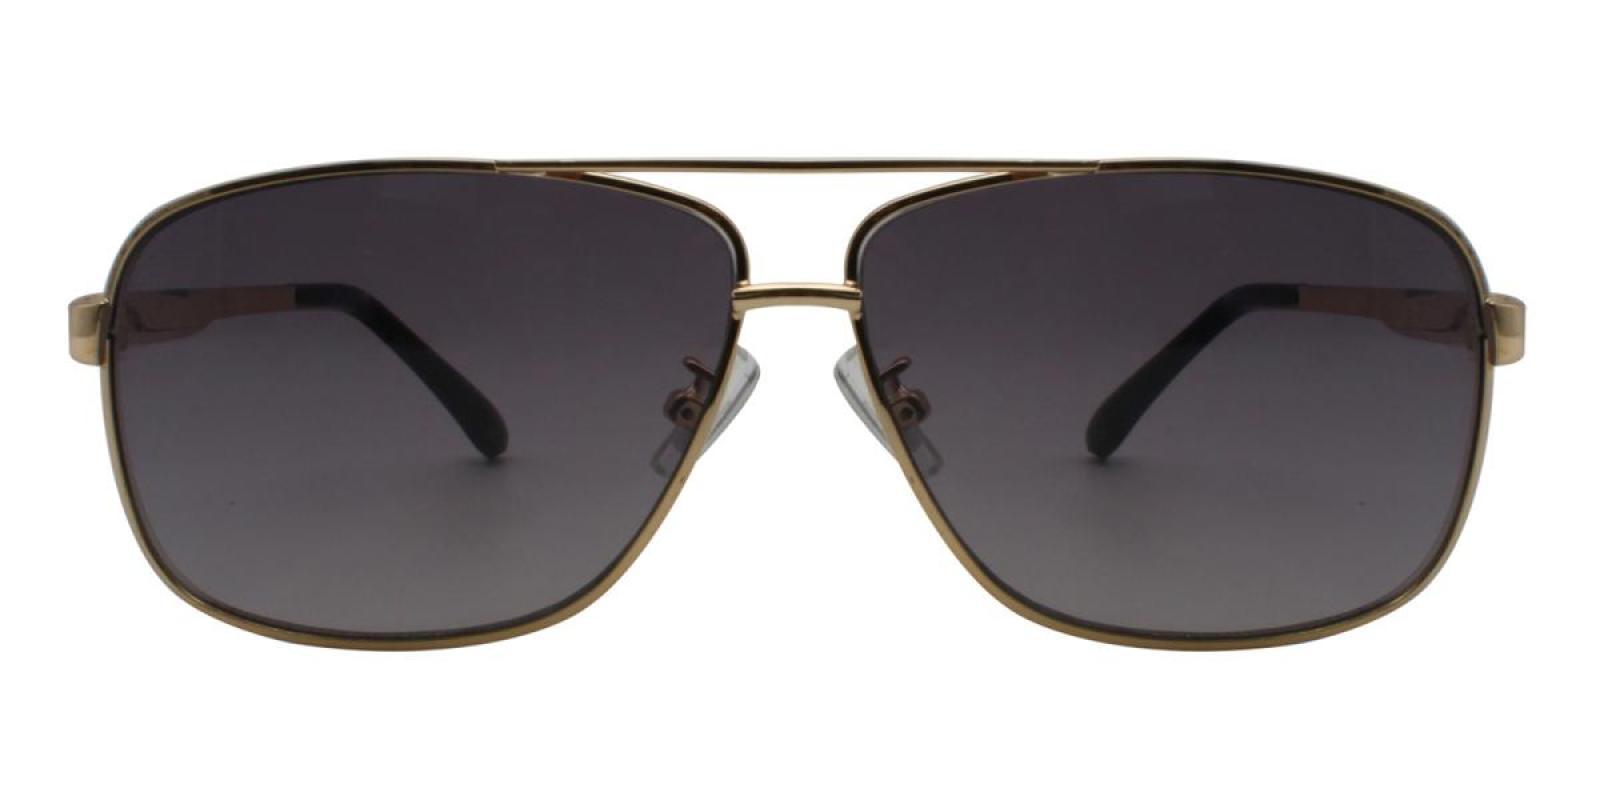 Marchisio-Gold-Aviator-Metal-Sunglasses-additional2